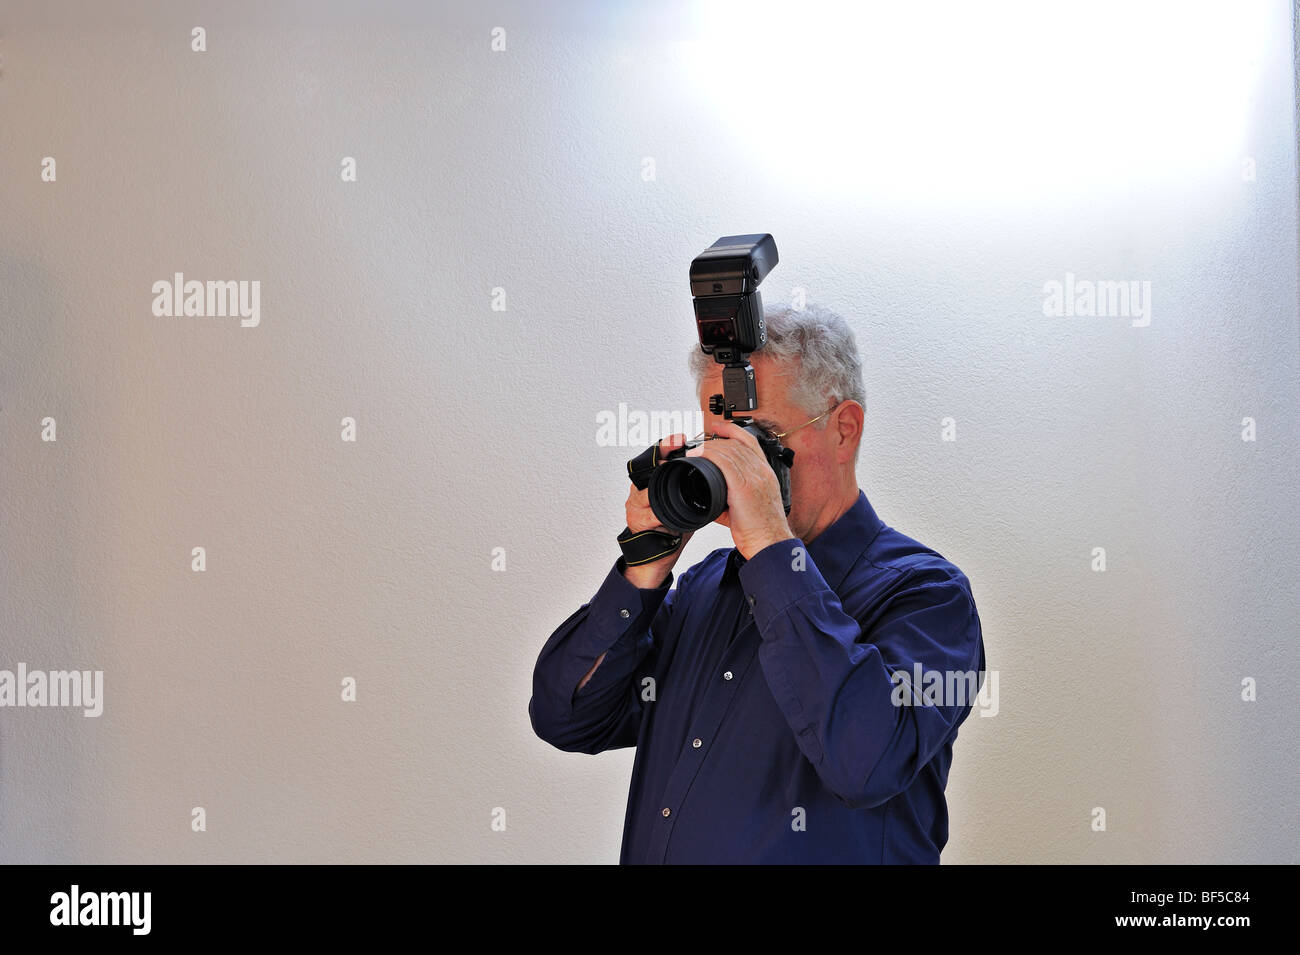 Photographic technique - Bounce flash - Stock Image